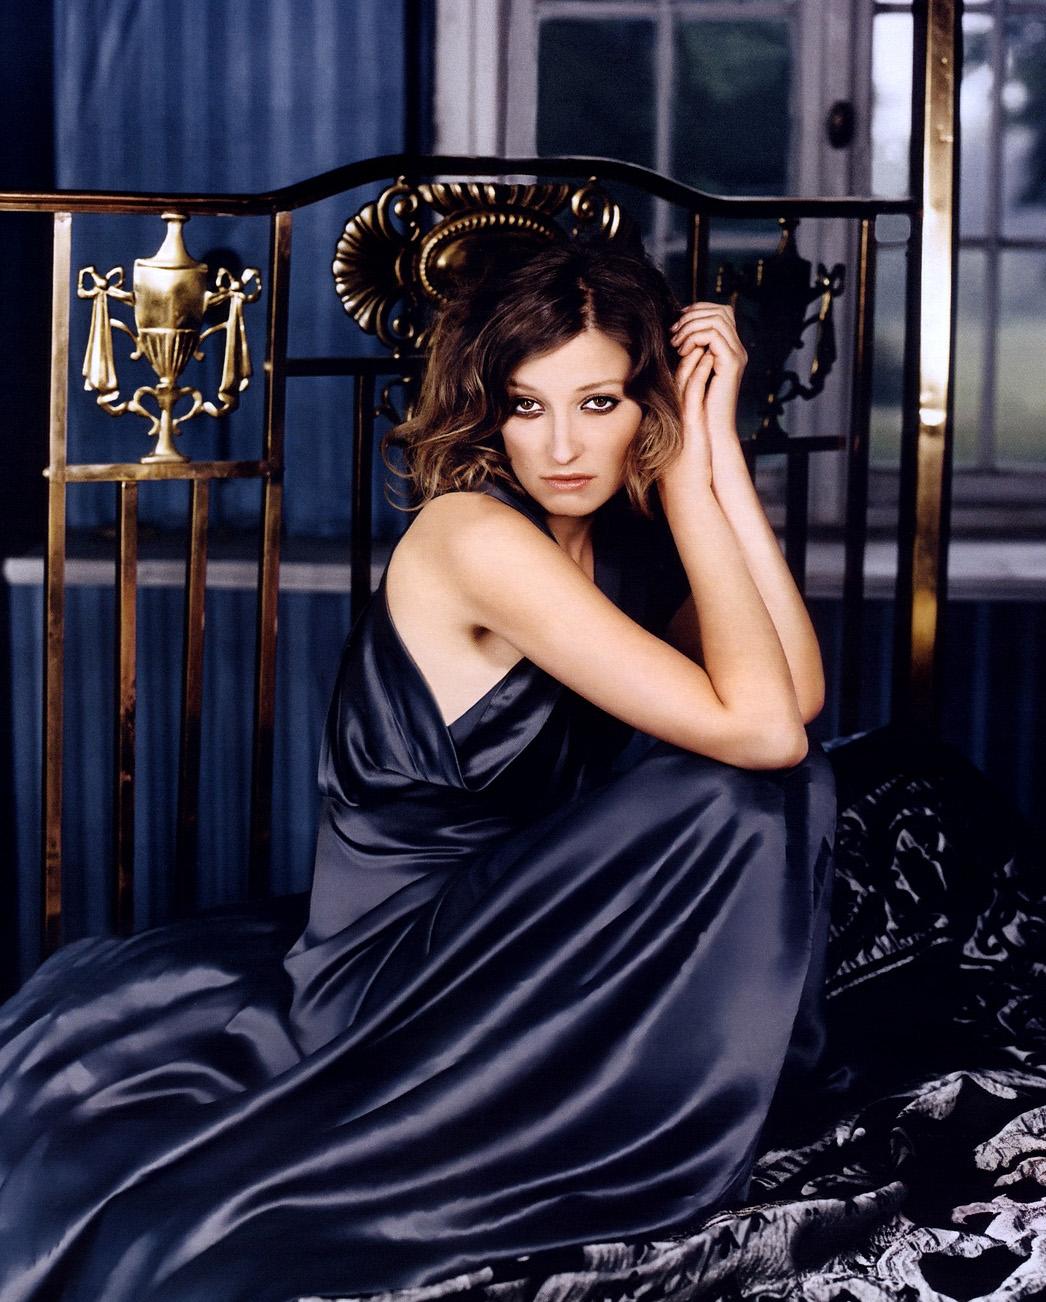 Alexandra Maria Lara. (With images) | Alexandra maria lara